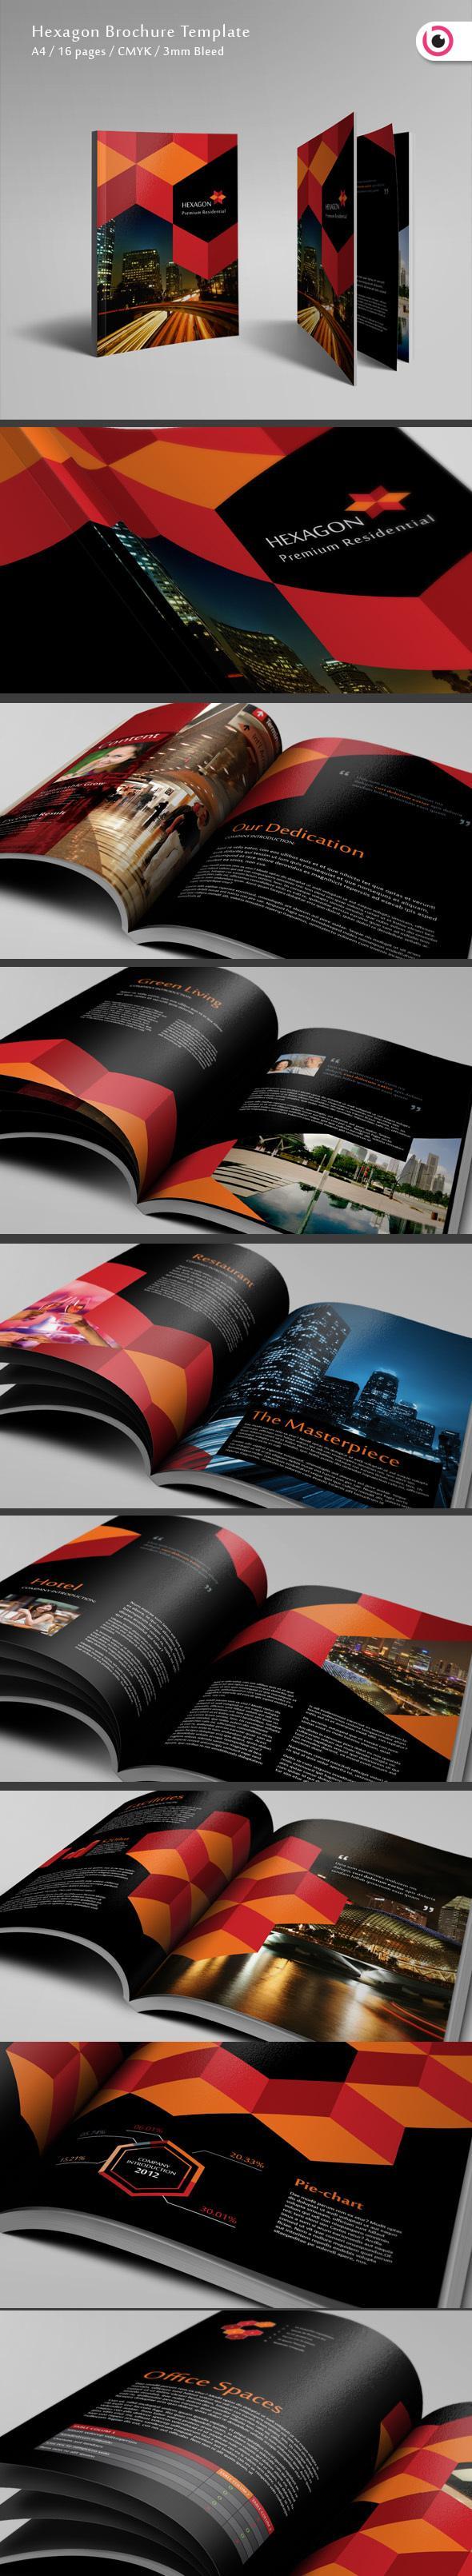 Hexagon Brochure Template on